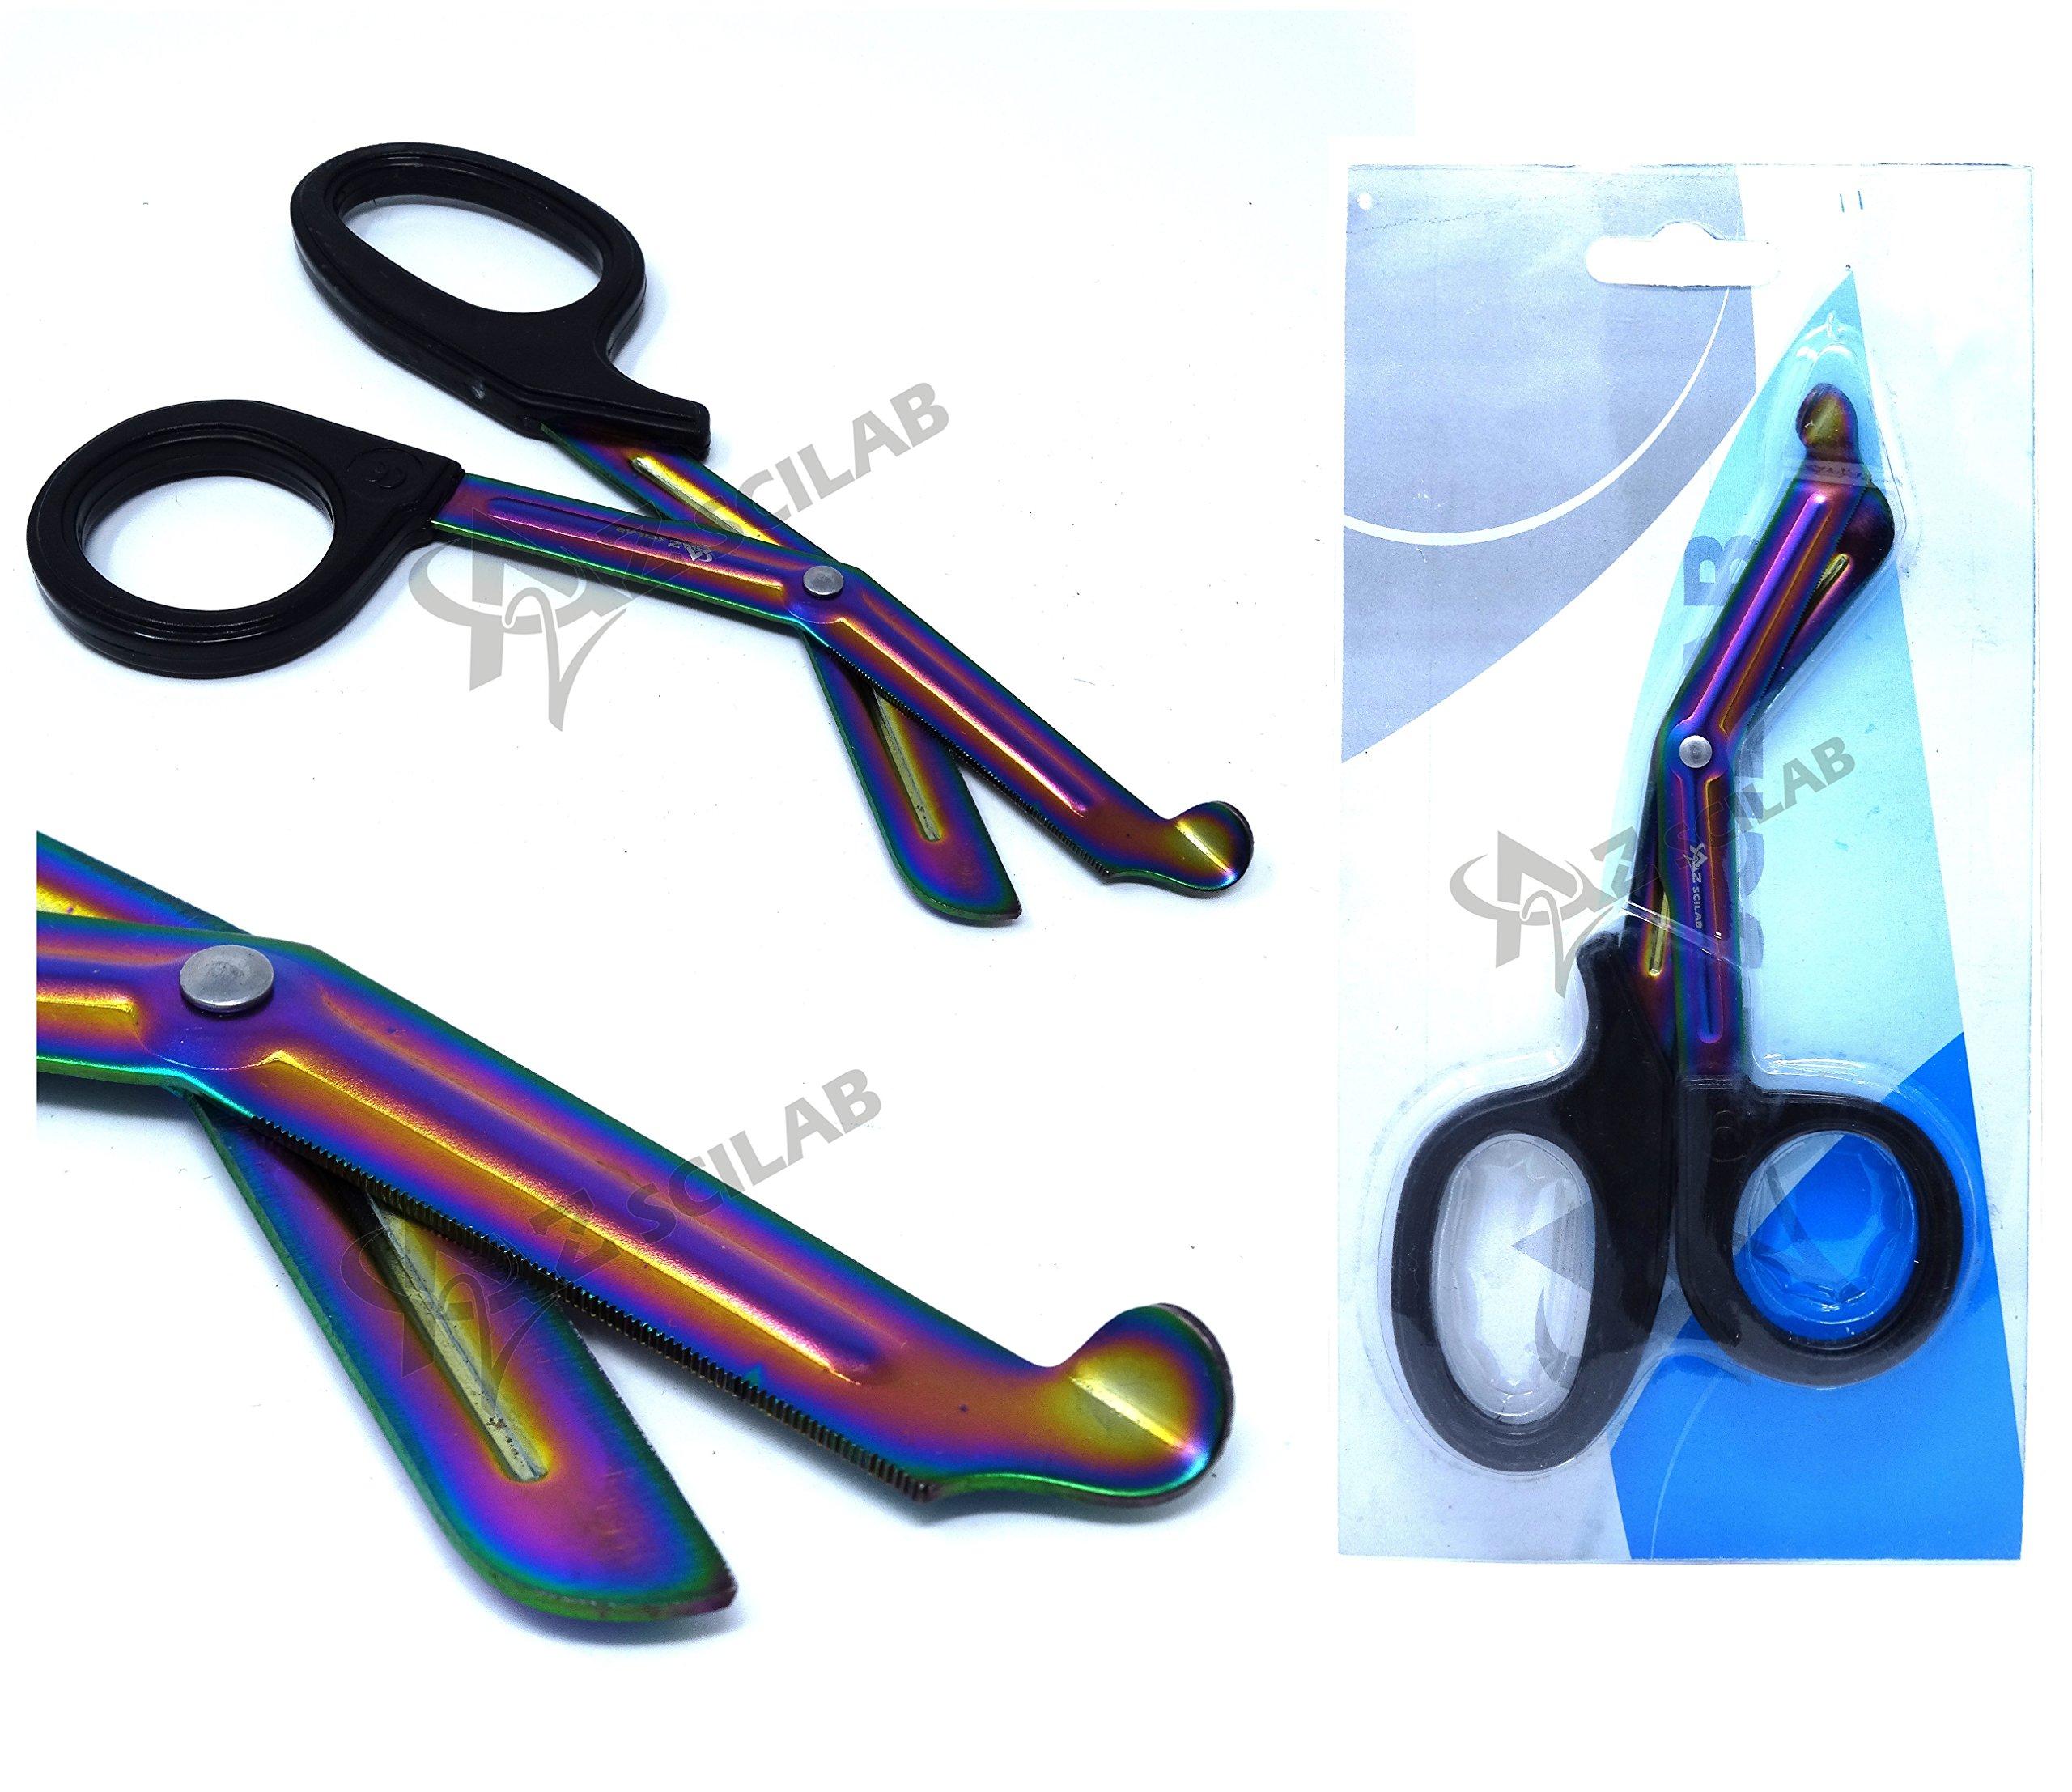 Heavy Duty Fluoride Coated Nurse Doctor Medical Paramedic Trauma Shears Scissors 7.25'' (A2ZSCILAB) (BLACK MULTI COLOR BLADE)